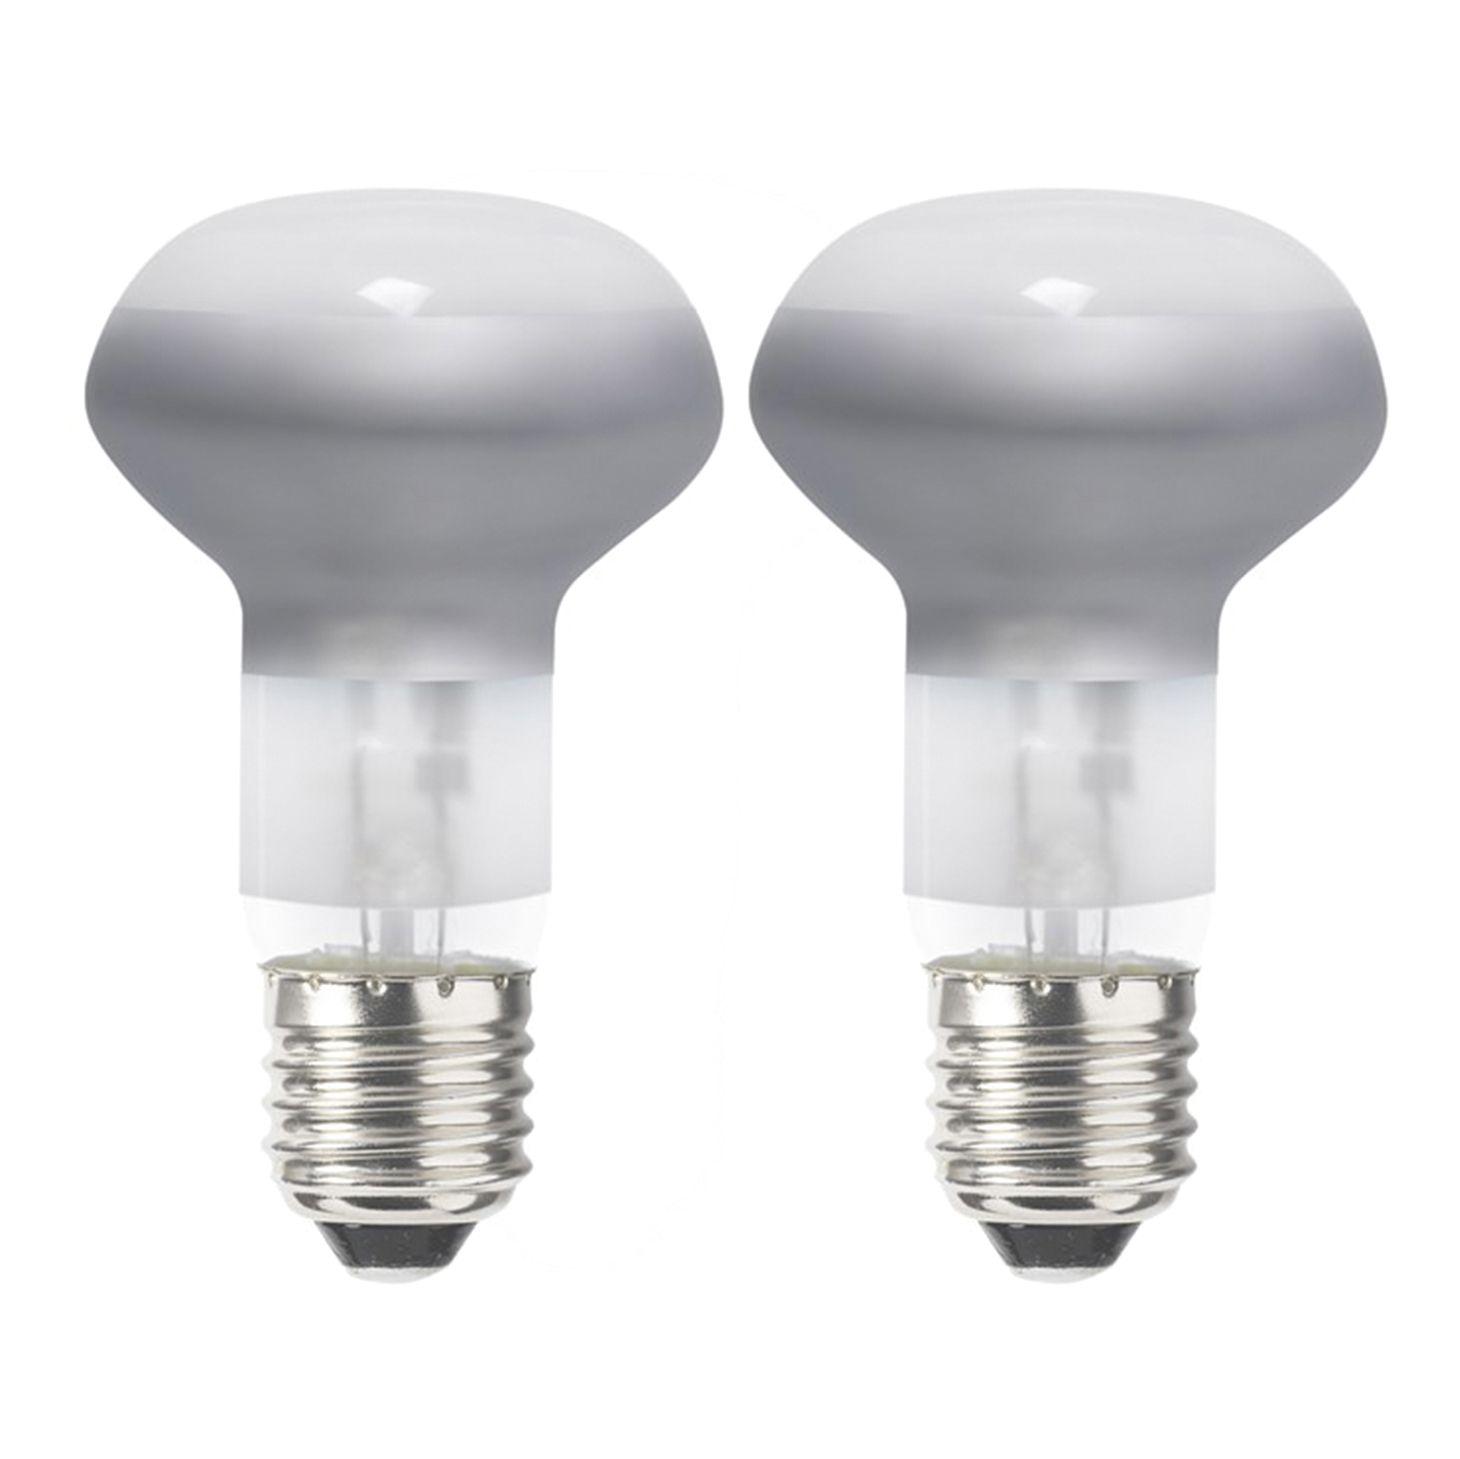 Sylvania E W Halogen Dimmable Reflector Spot Light Bulb Pack